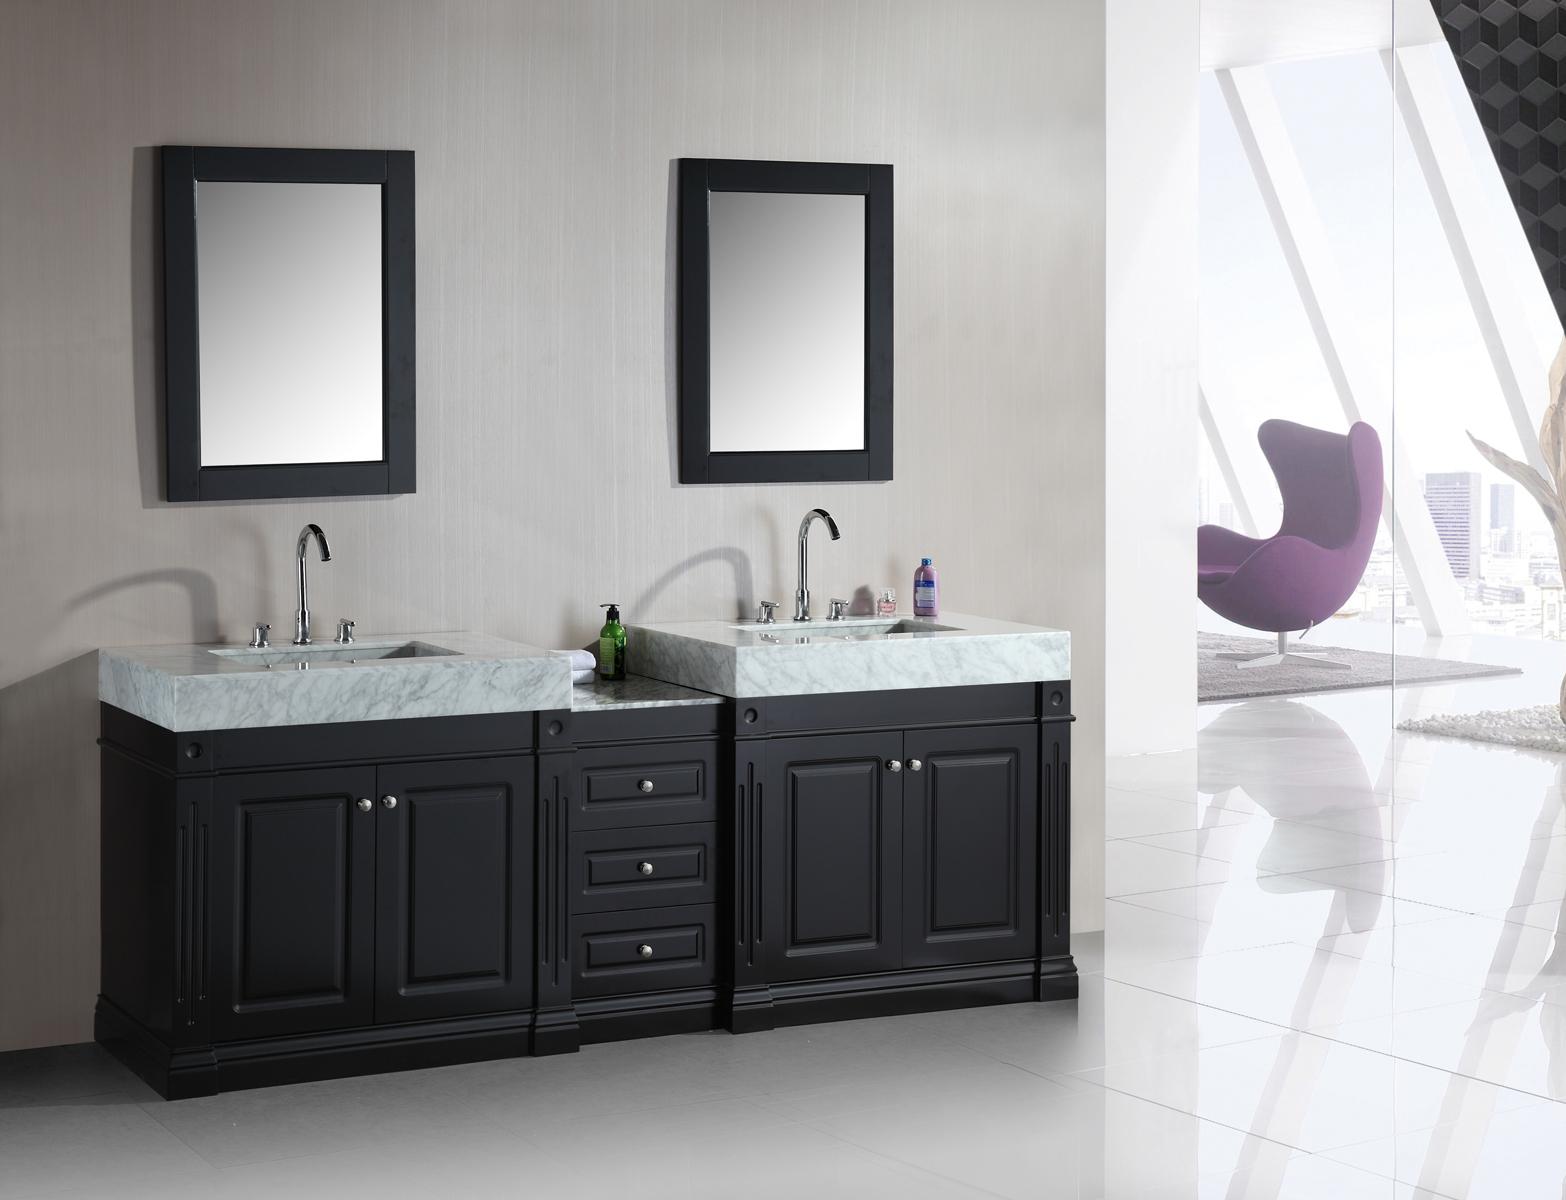 odyssey 88u2033 double sink vanity set with trough style sinks | design element JAUDGWU